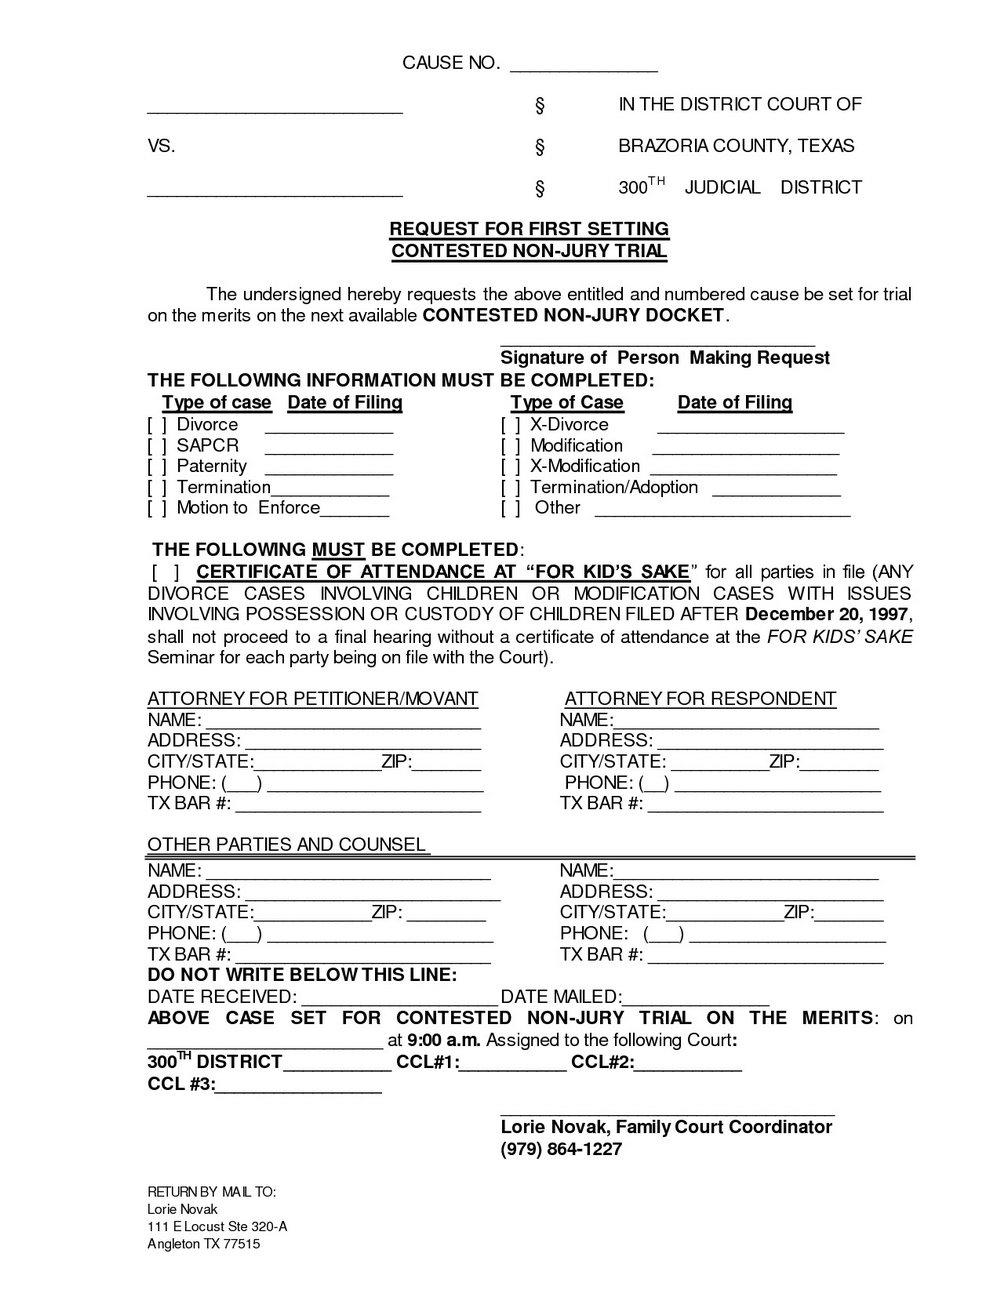 Louisiana Divorce Forms Free